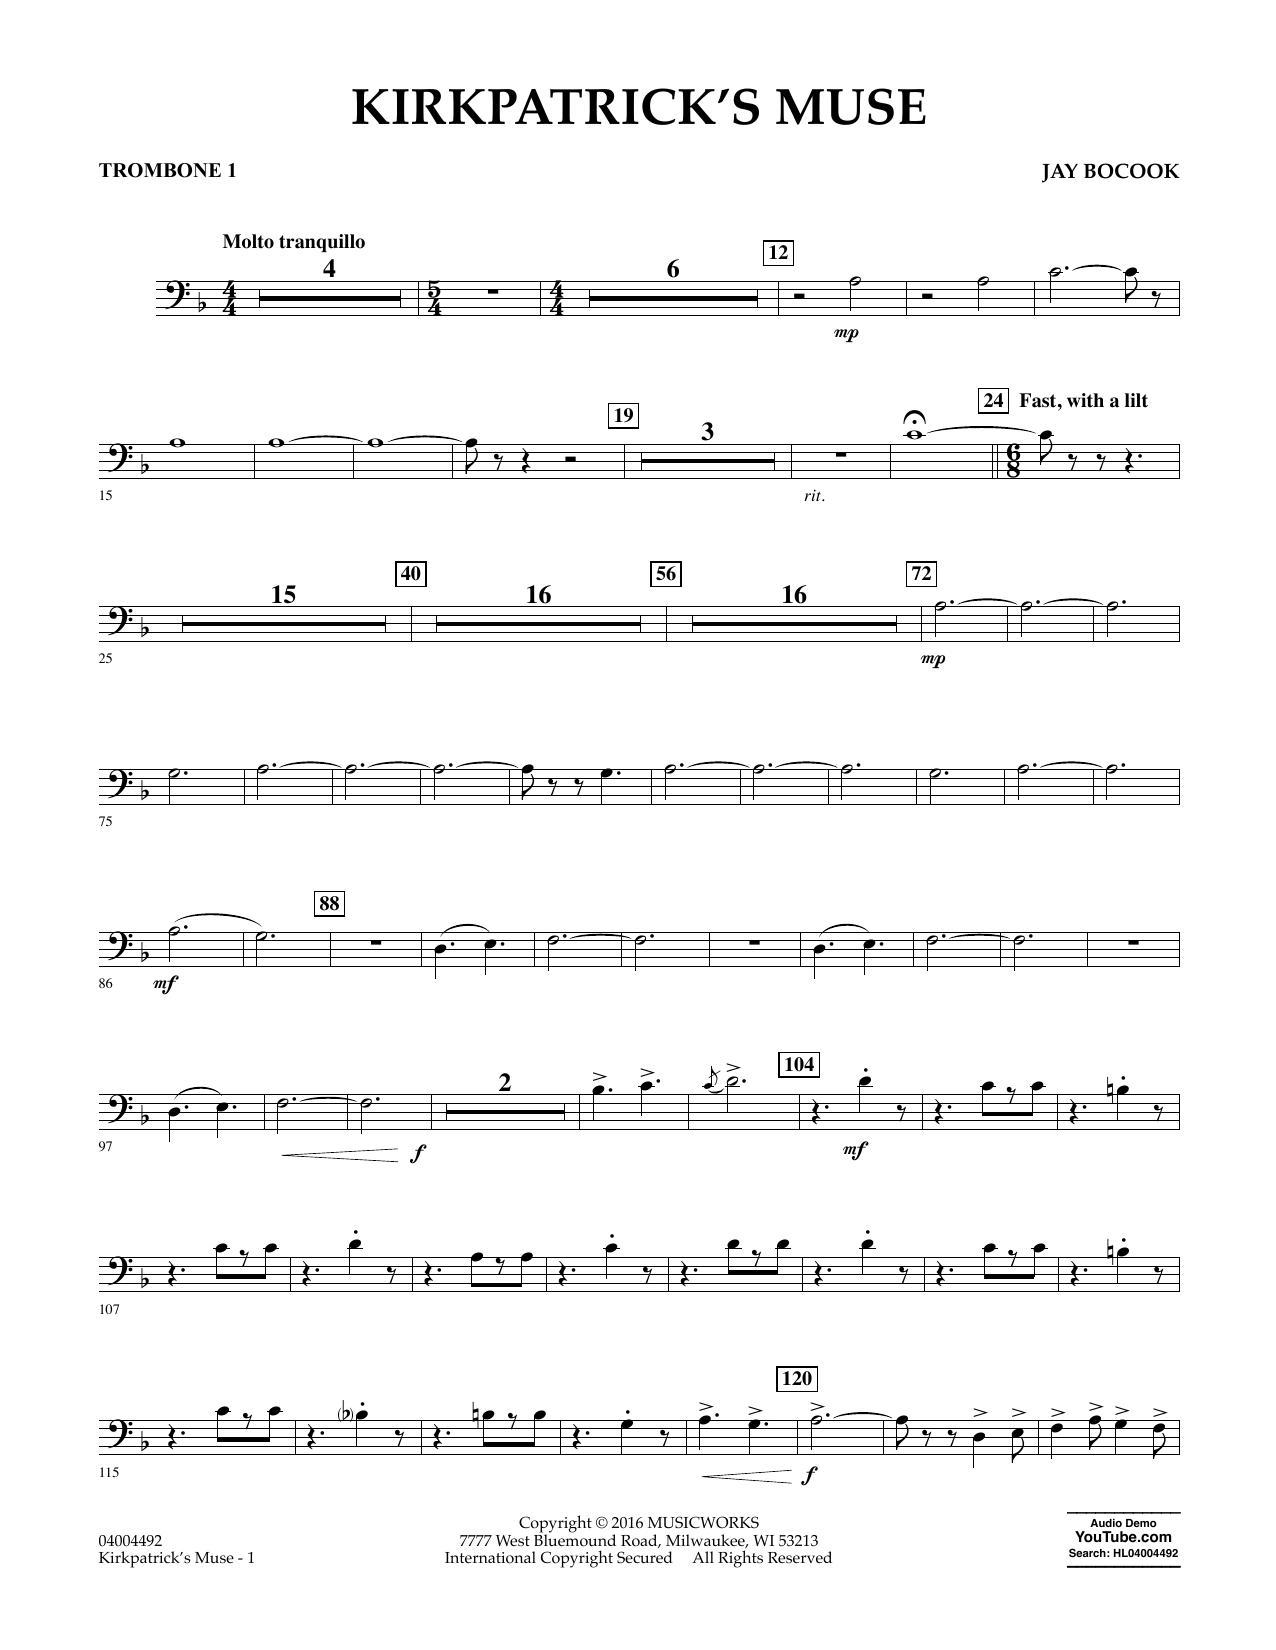 Kirkpatrick's Muse - Trombone 1